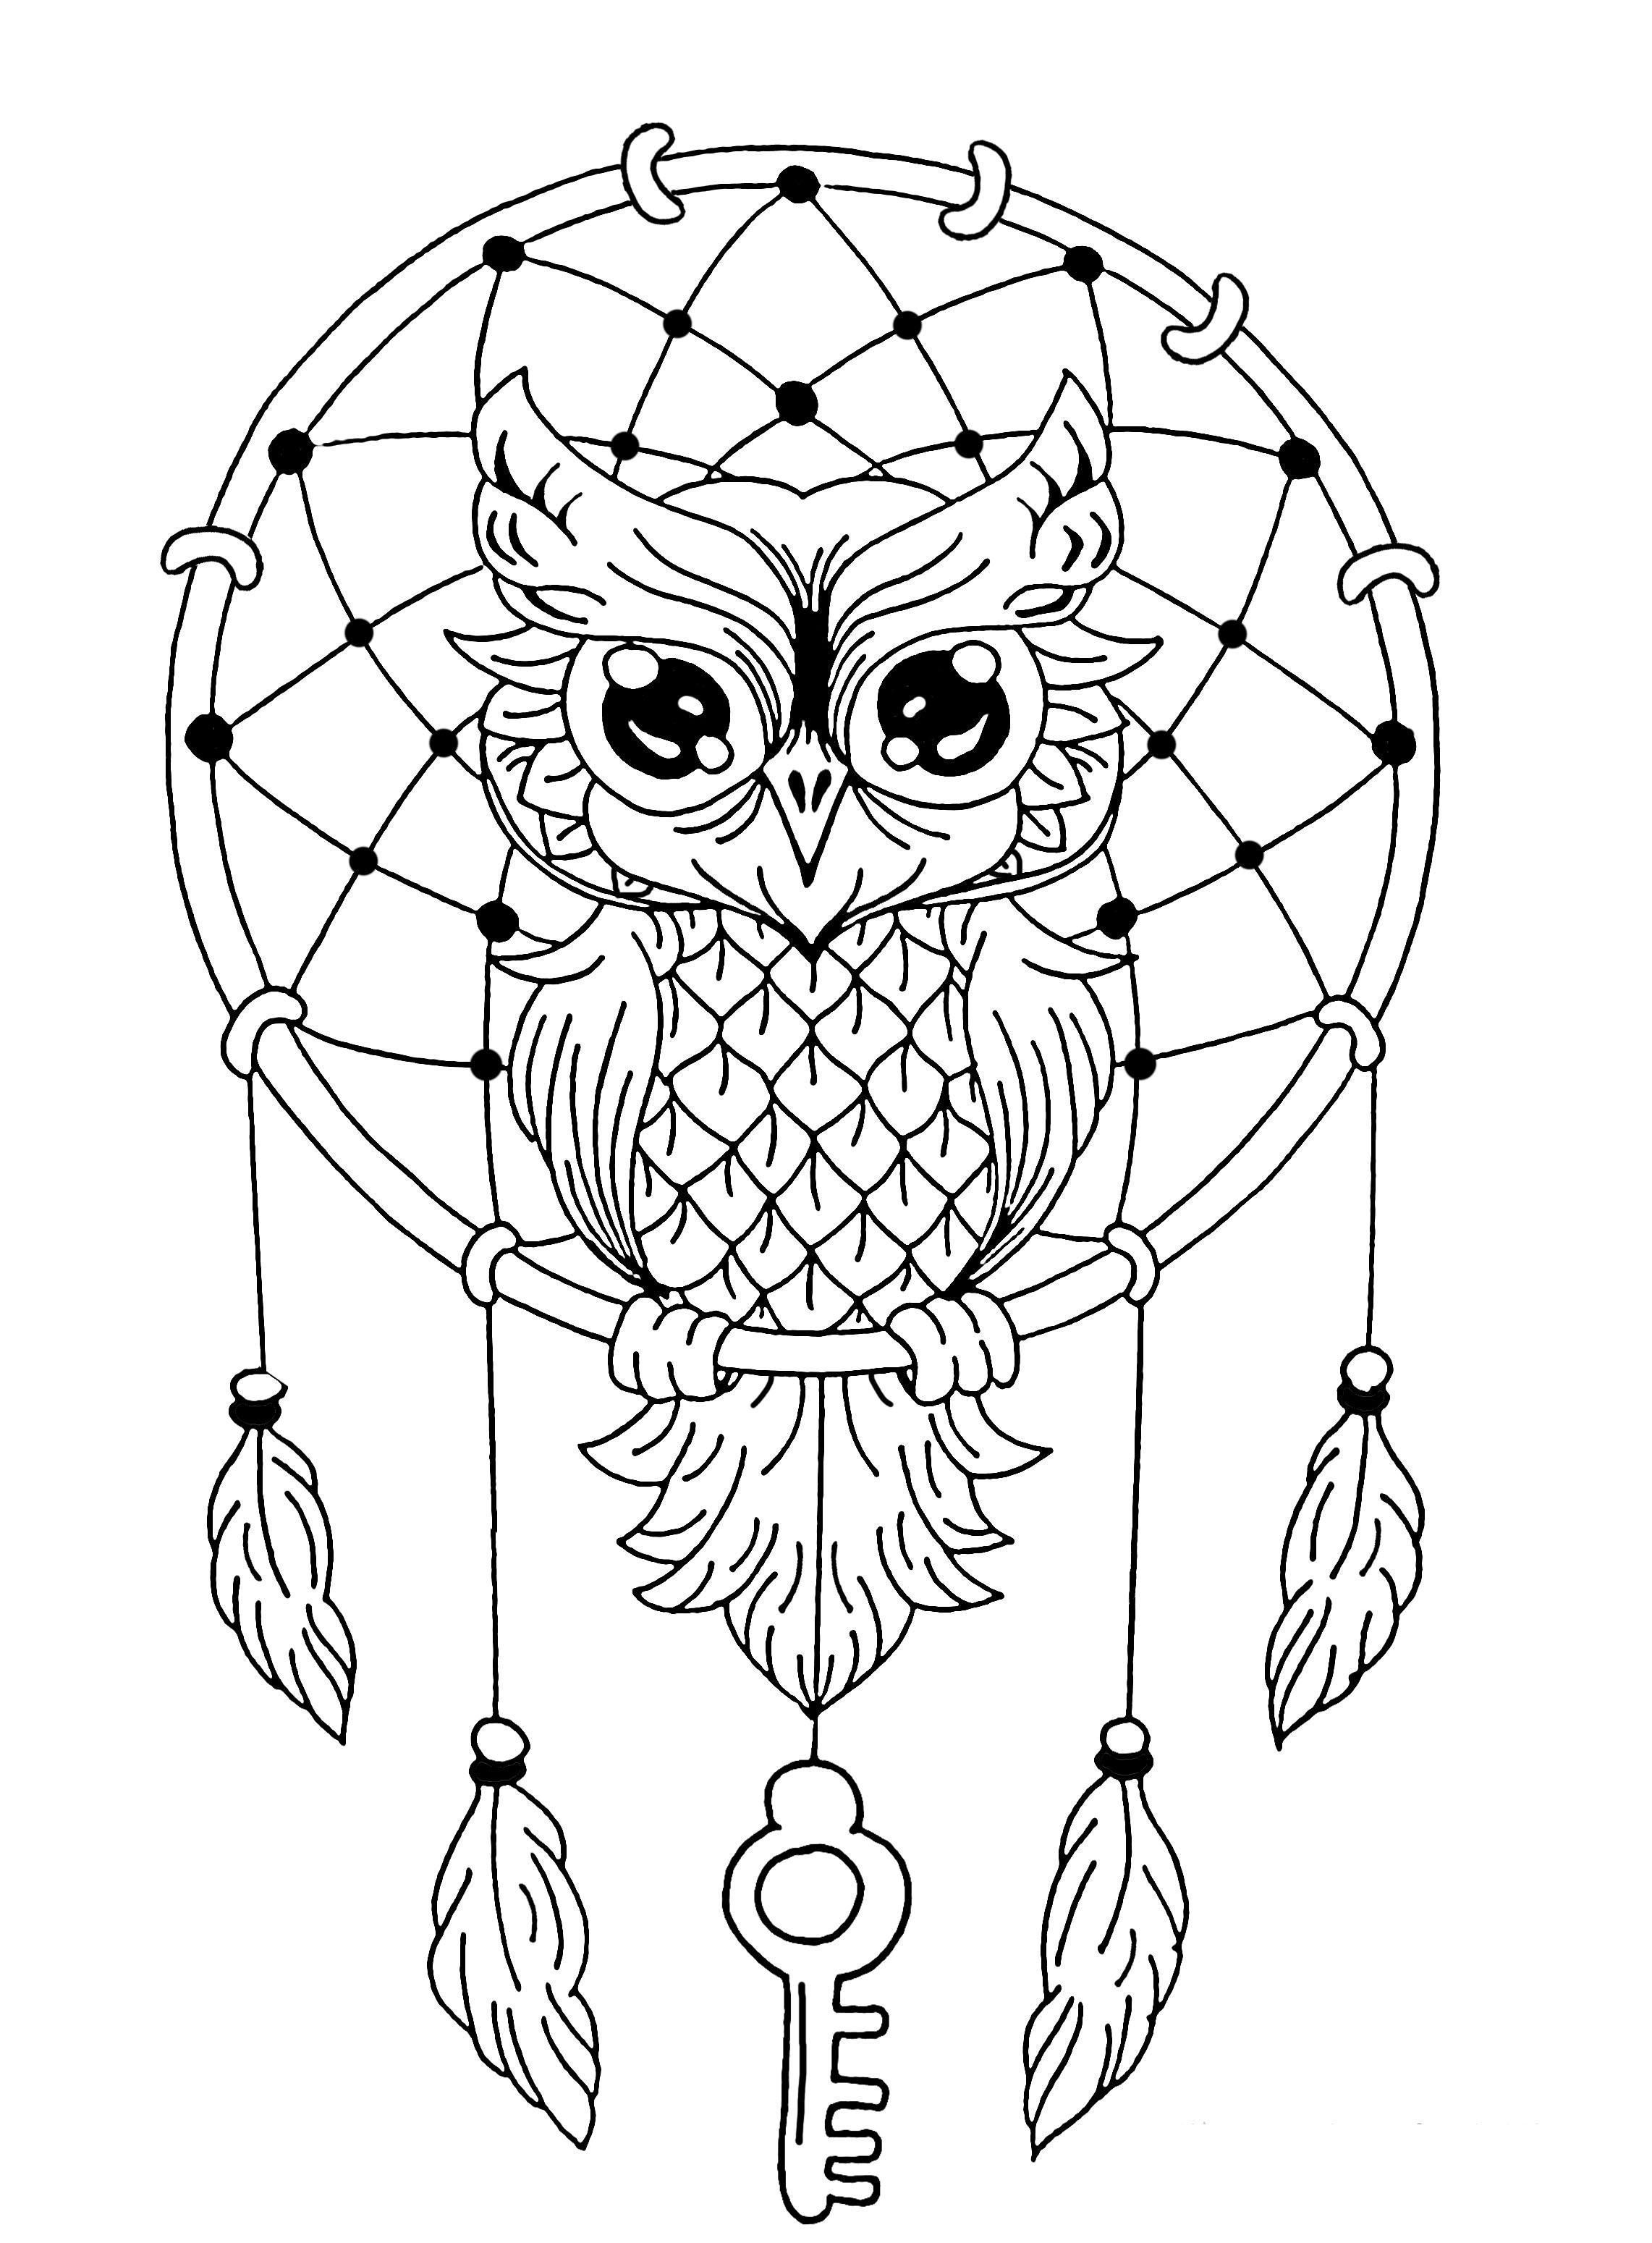 Coloriage Mandala Facile A Imprimer.Coloriage Mandala Animaux A Imprimer Gratuit Mandala Dream